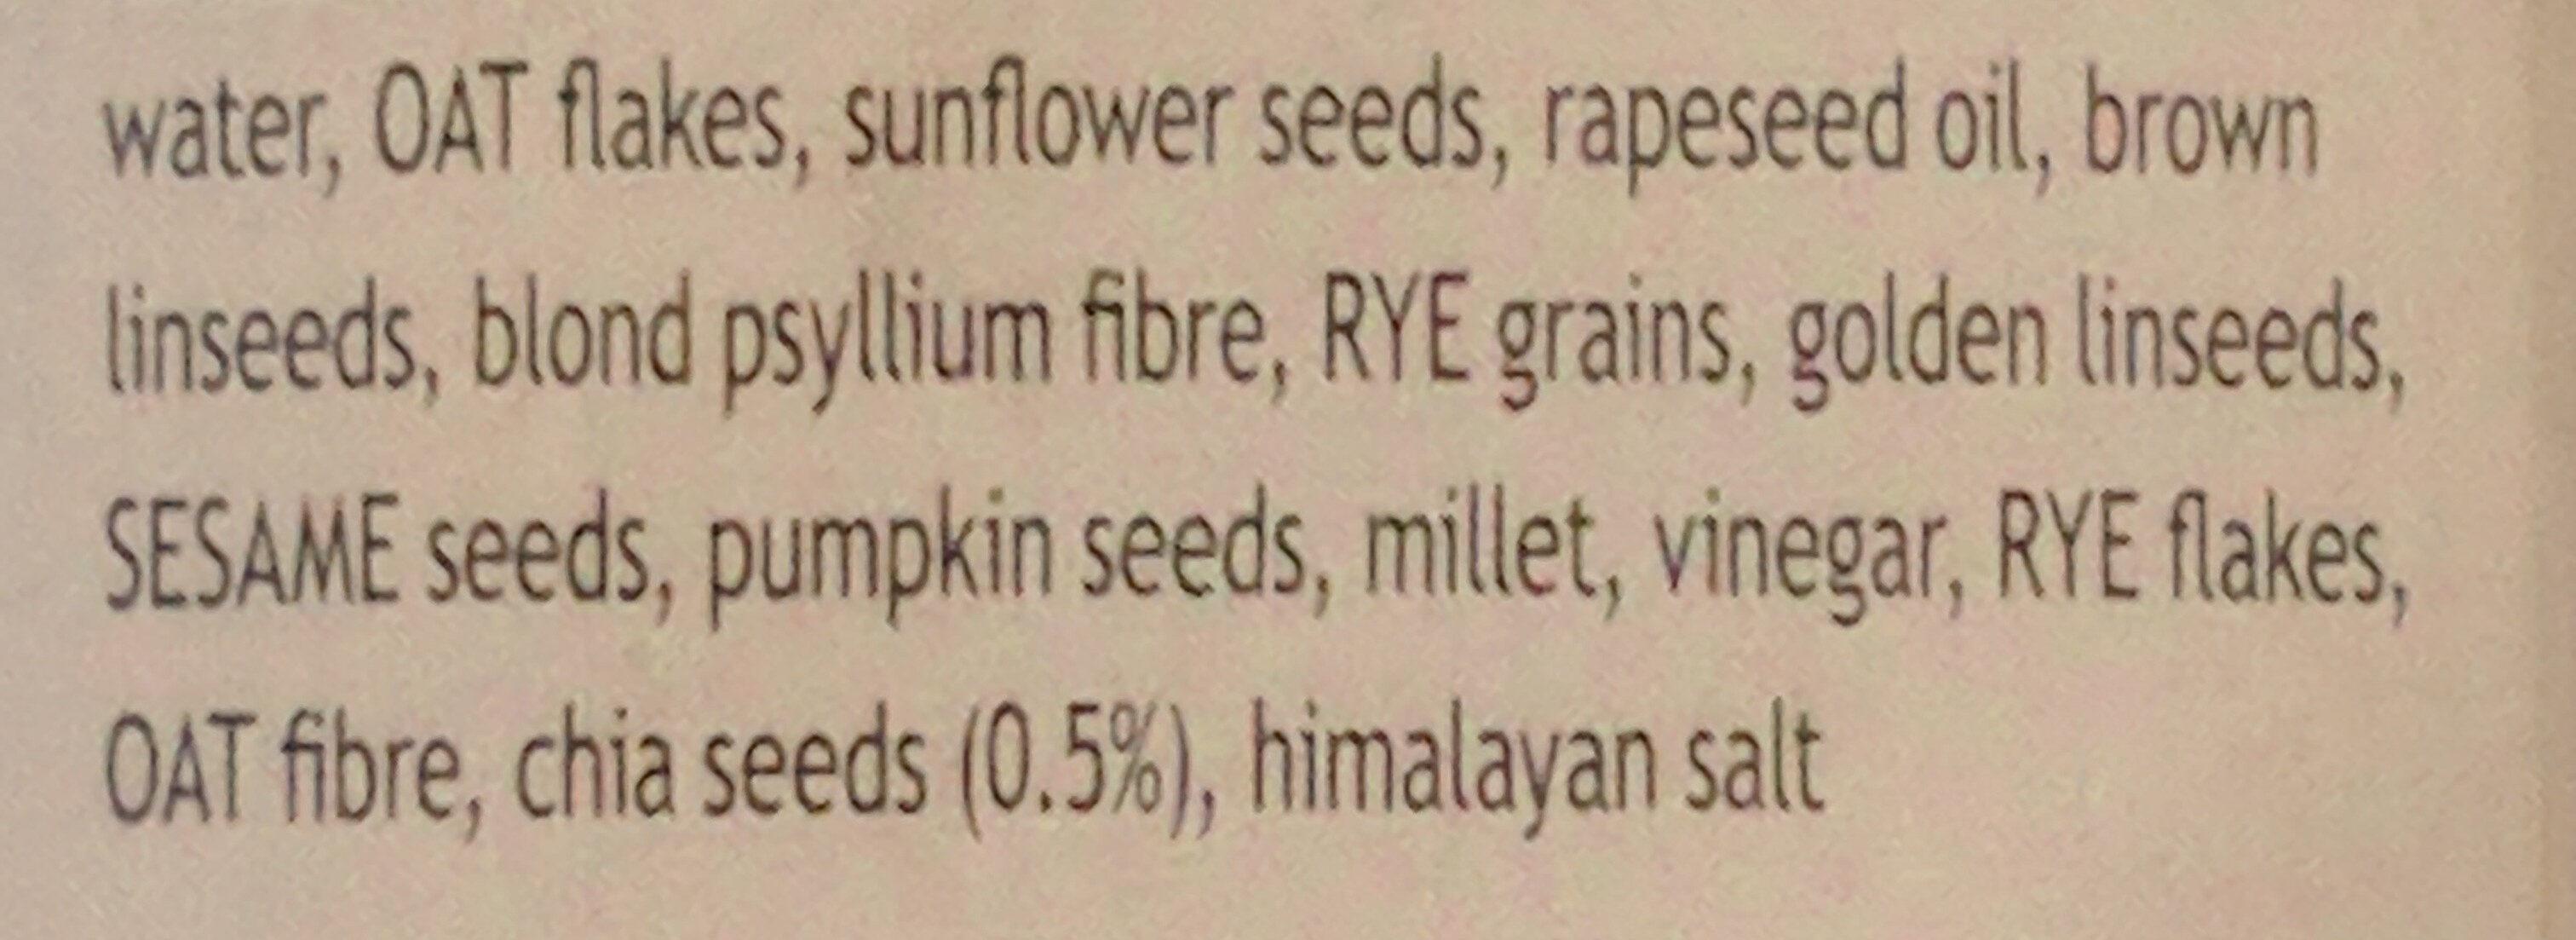 Pure Grain Bread with Chia Seeds - Ingrédients - en